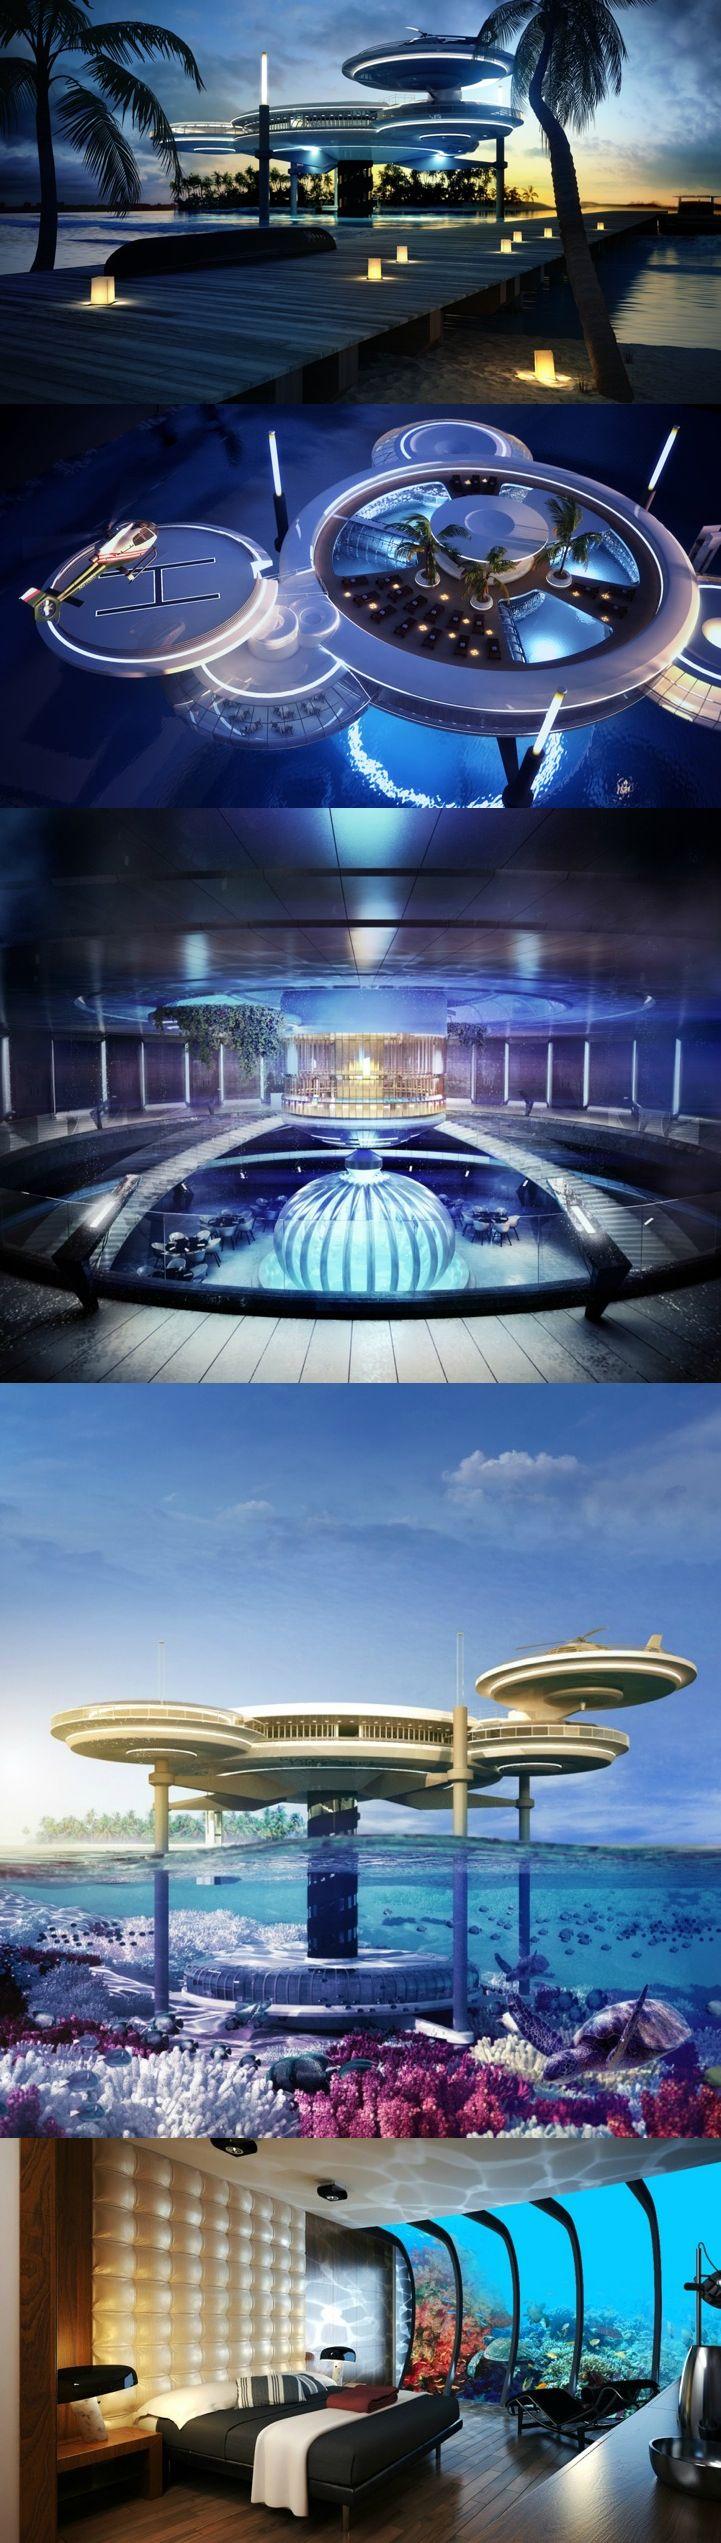 Dubai underwater hotel blueskywindows upvc for Modern hotel dubai